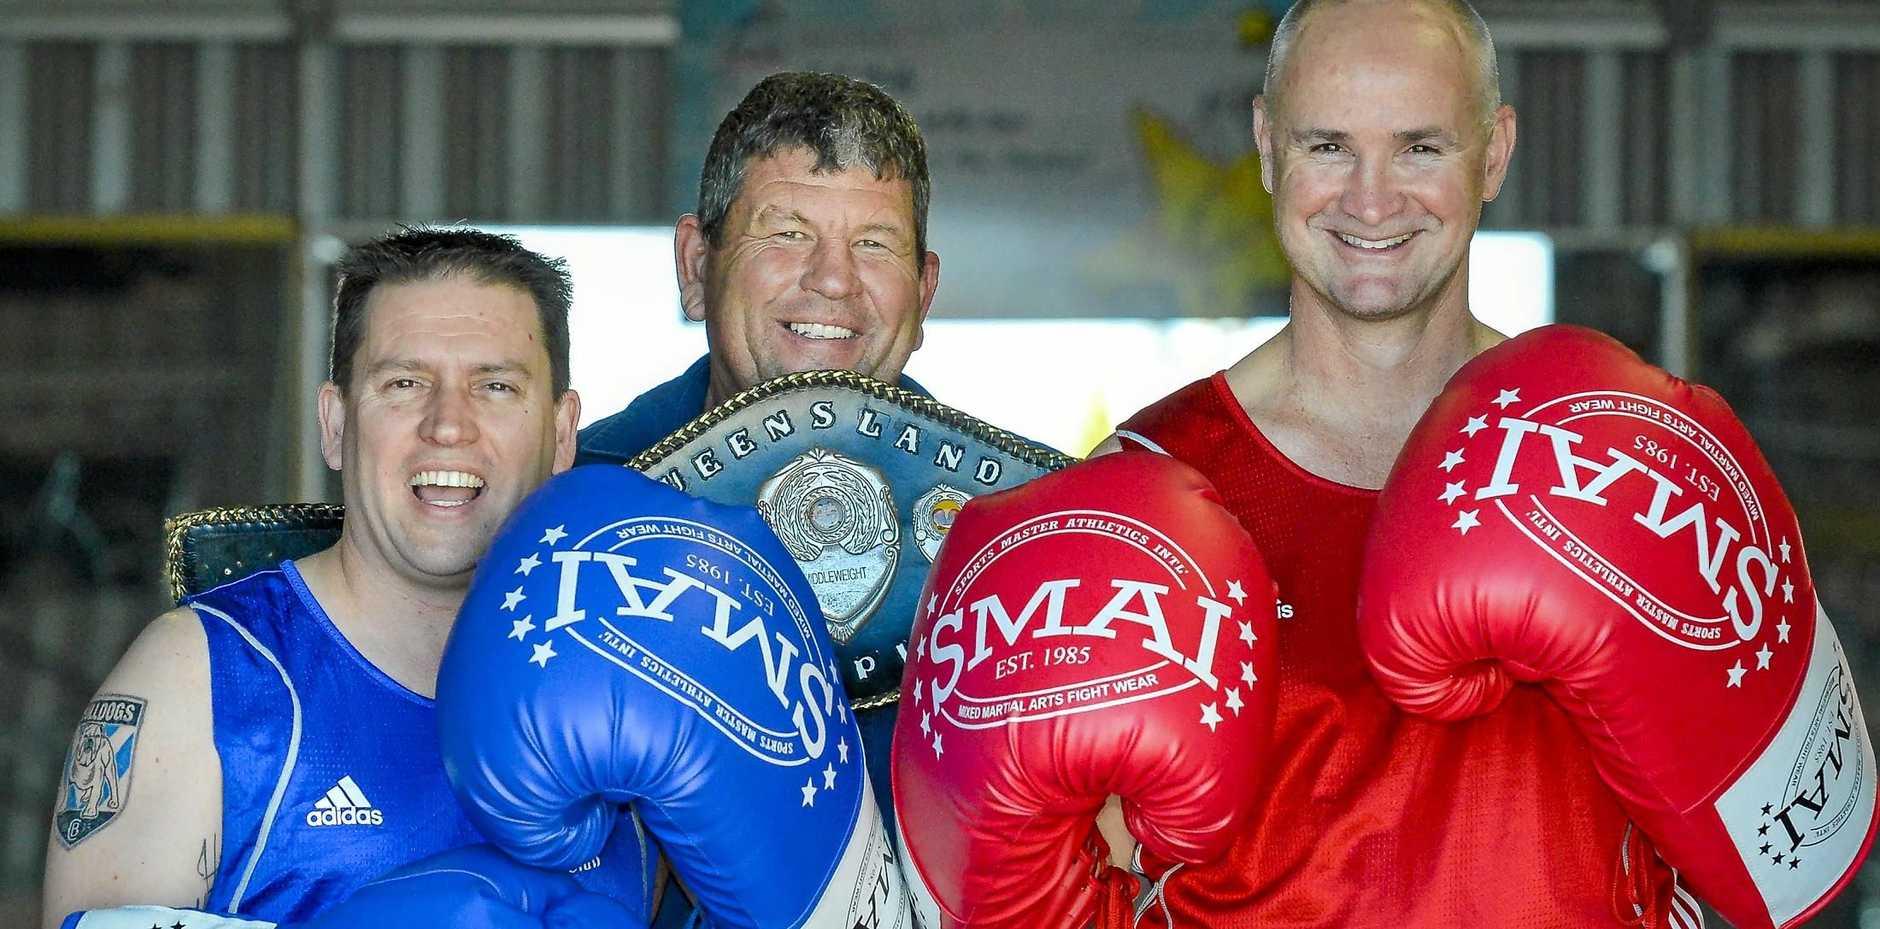 IT'S ON: Mayor Matt Burnett, Mick Daly and MP Glenn Butcher are ready for tonight's charity boxing match.